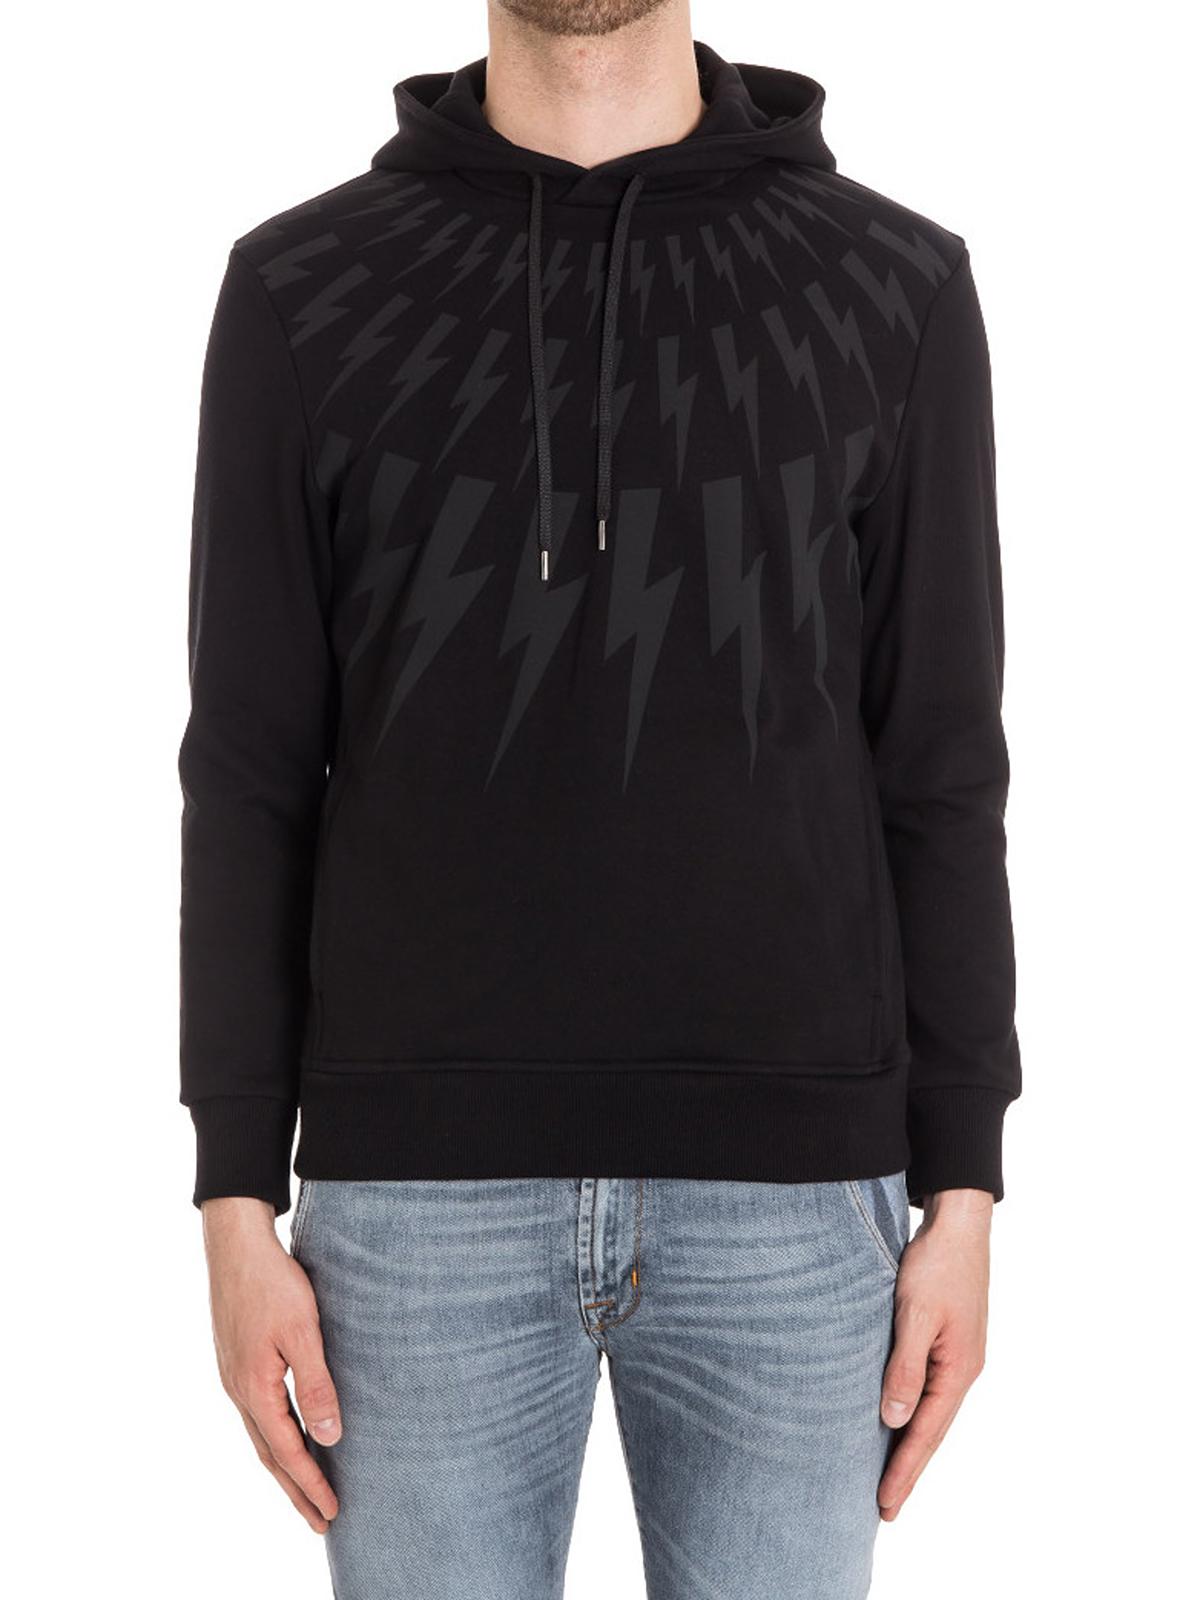 9576a2b59bb2 NEIL BARRETT  Felpe e maglie online - Felpa nera con stampa fulmini